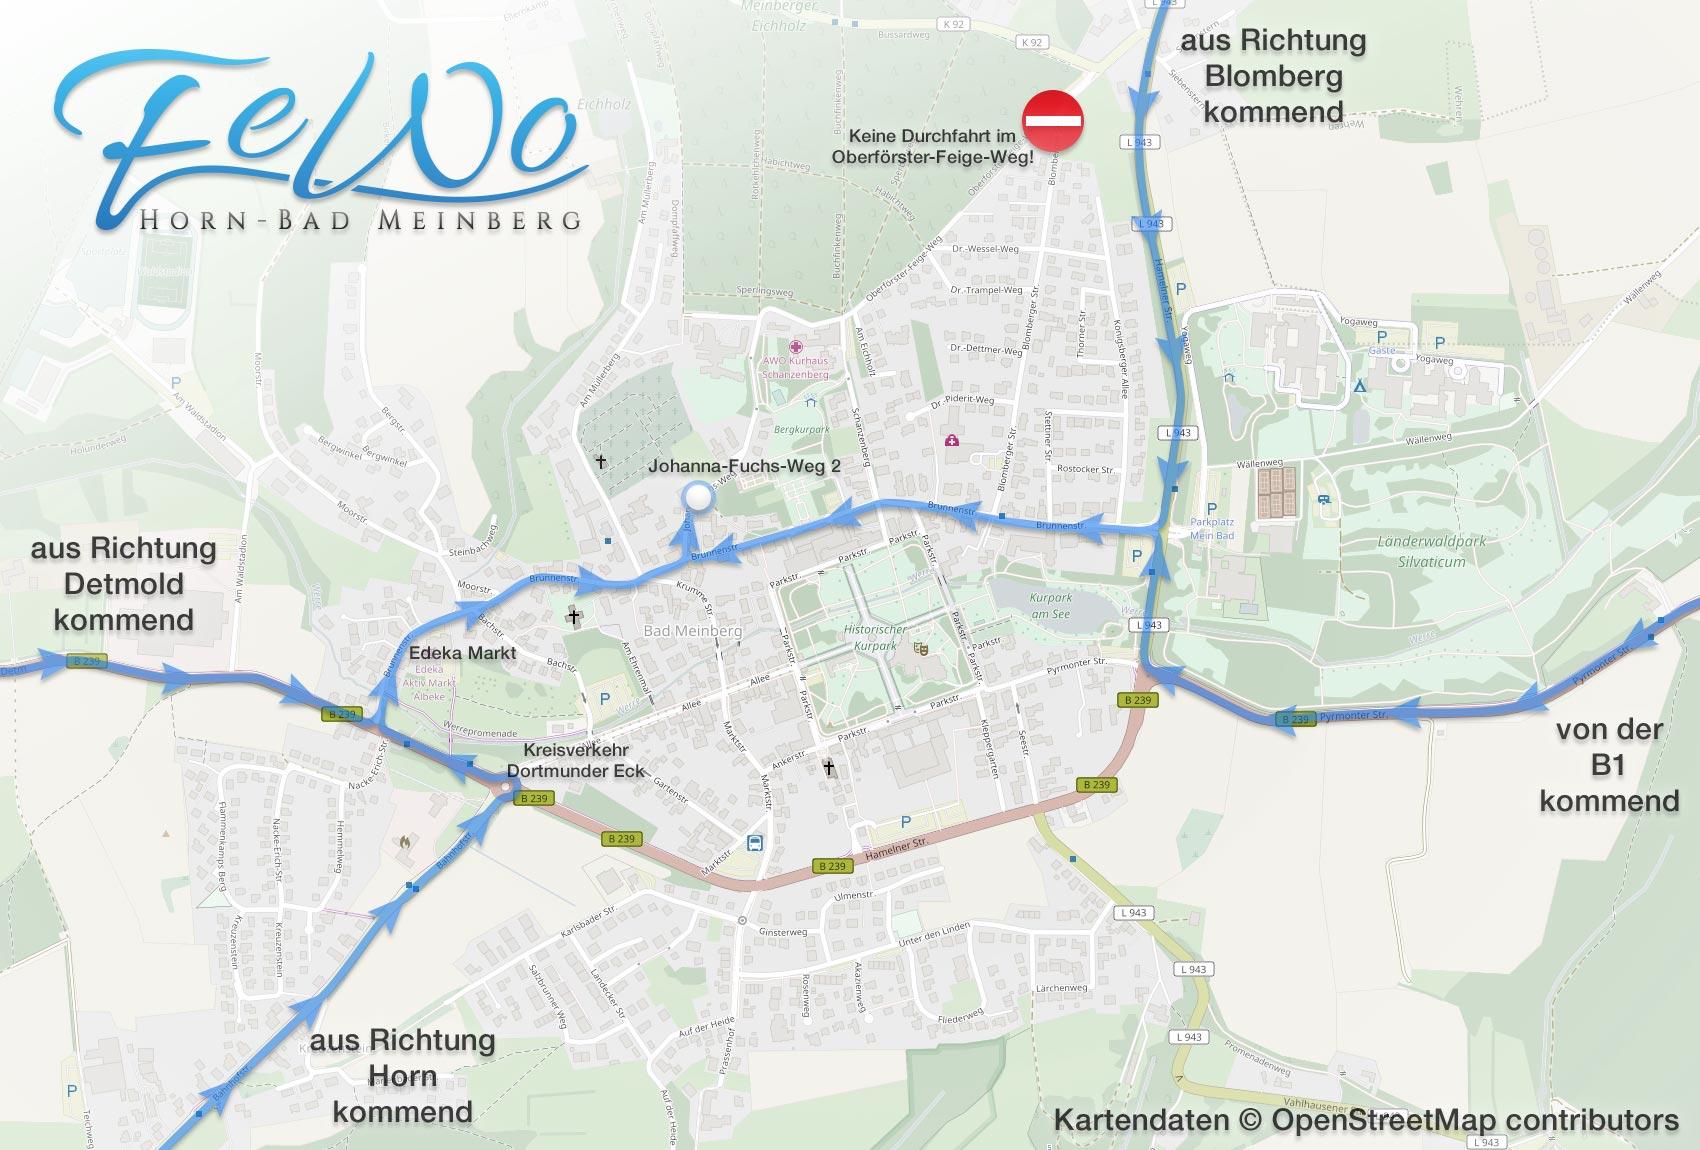 Fewo Horn-Bad Meinberg Anfahrsplan